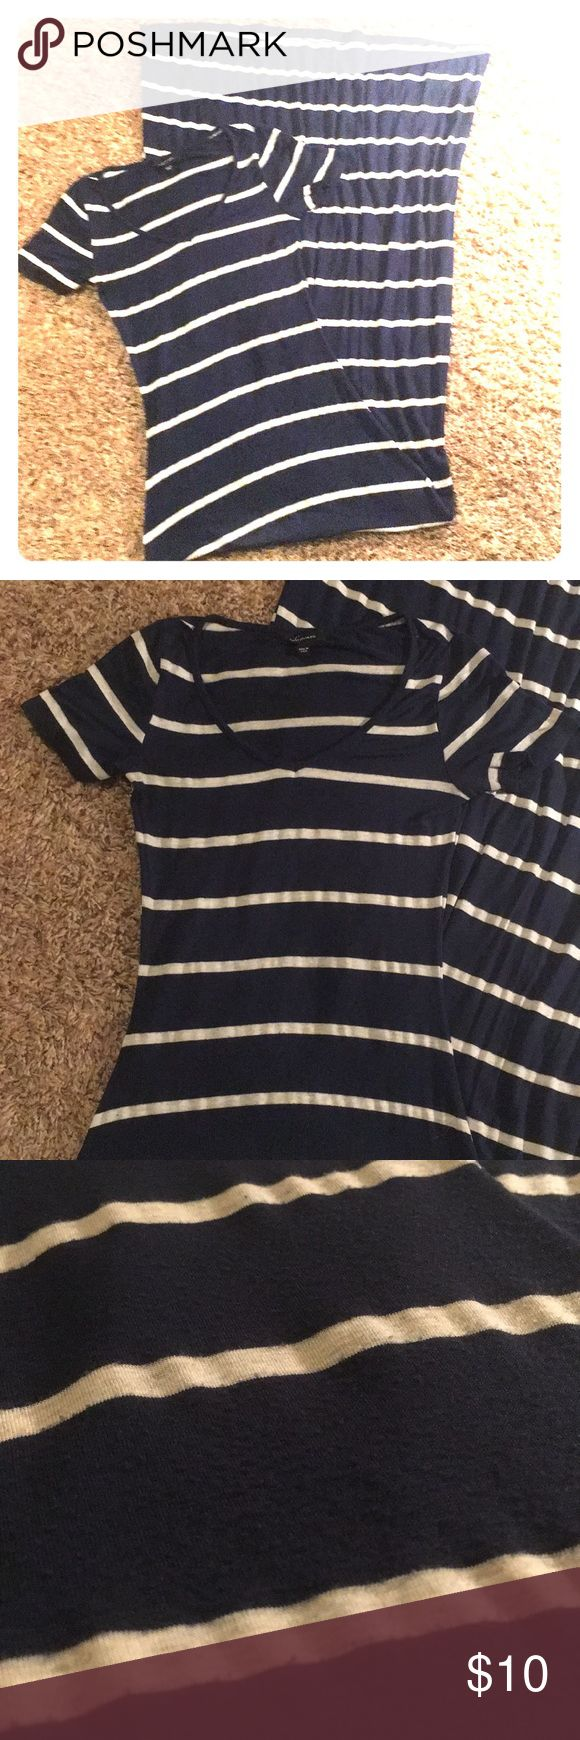 Maxi Dress Navy and oatmeal stripe maxi dress. Super soft cotton. EUC. No flaws. Bought at Von Maur. Soprano Dresses Maxi